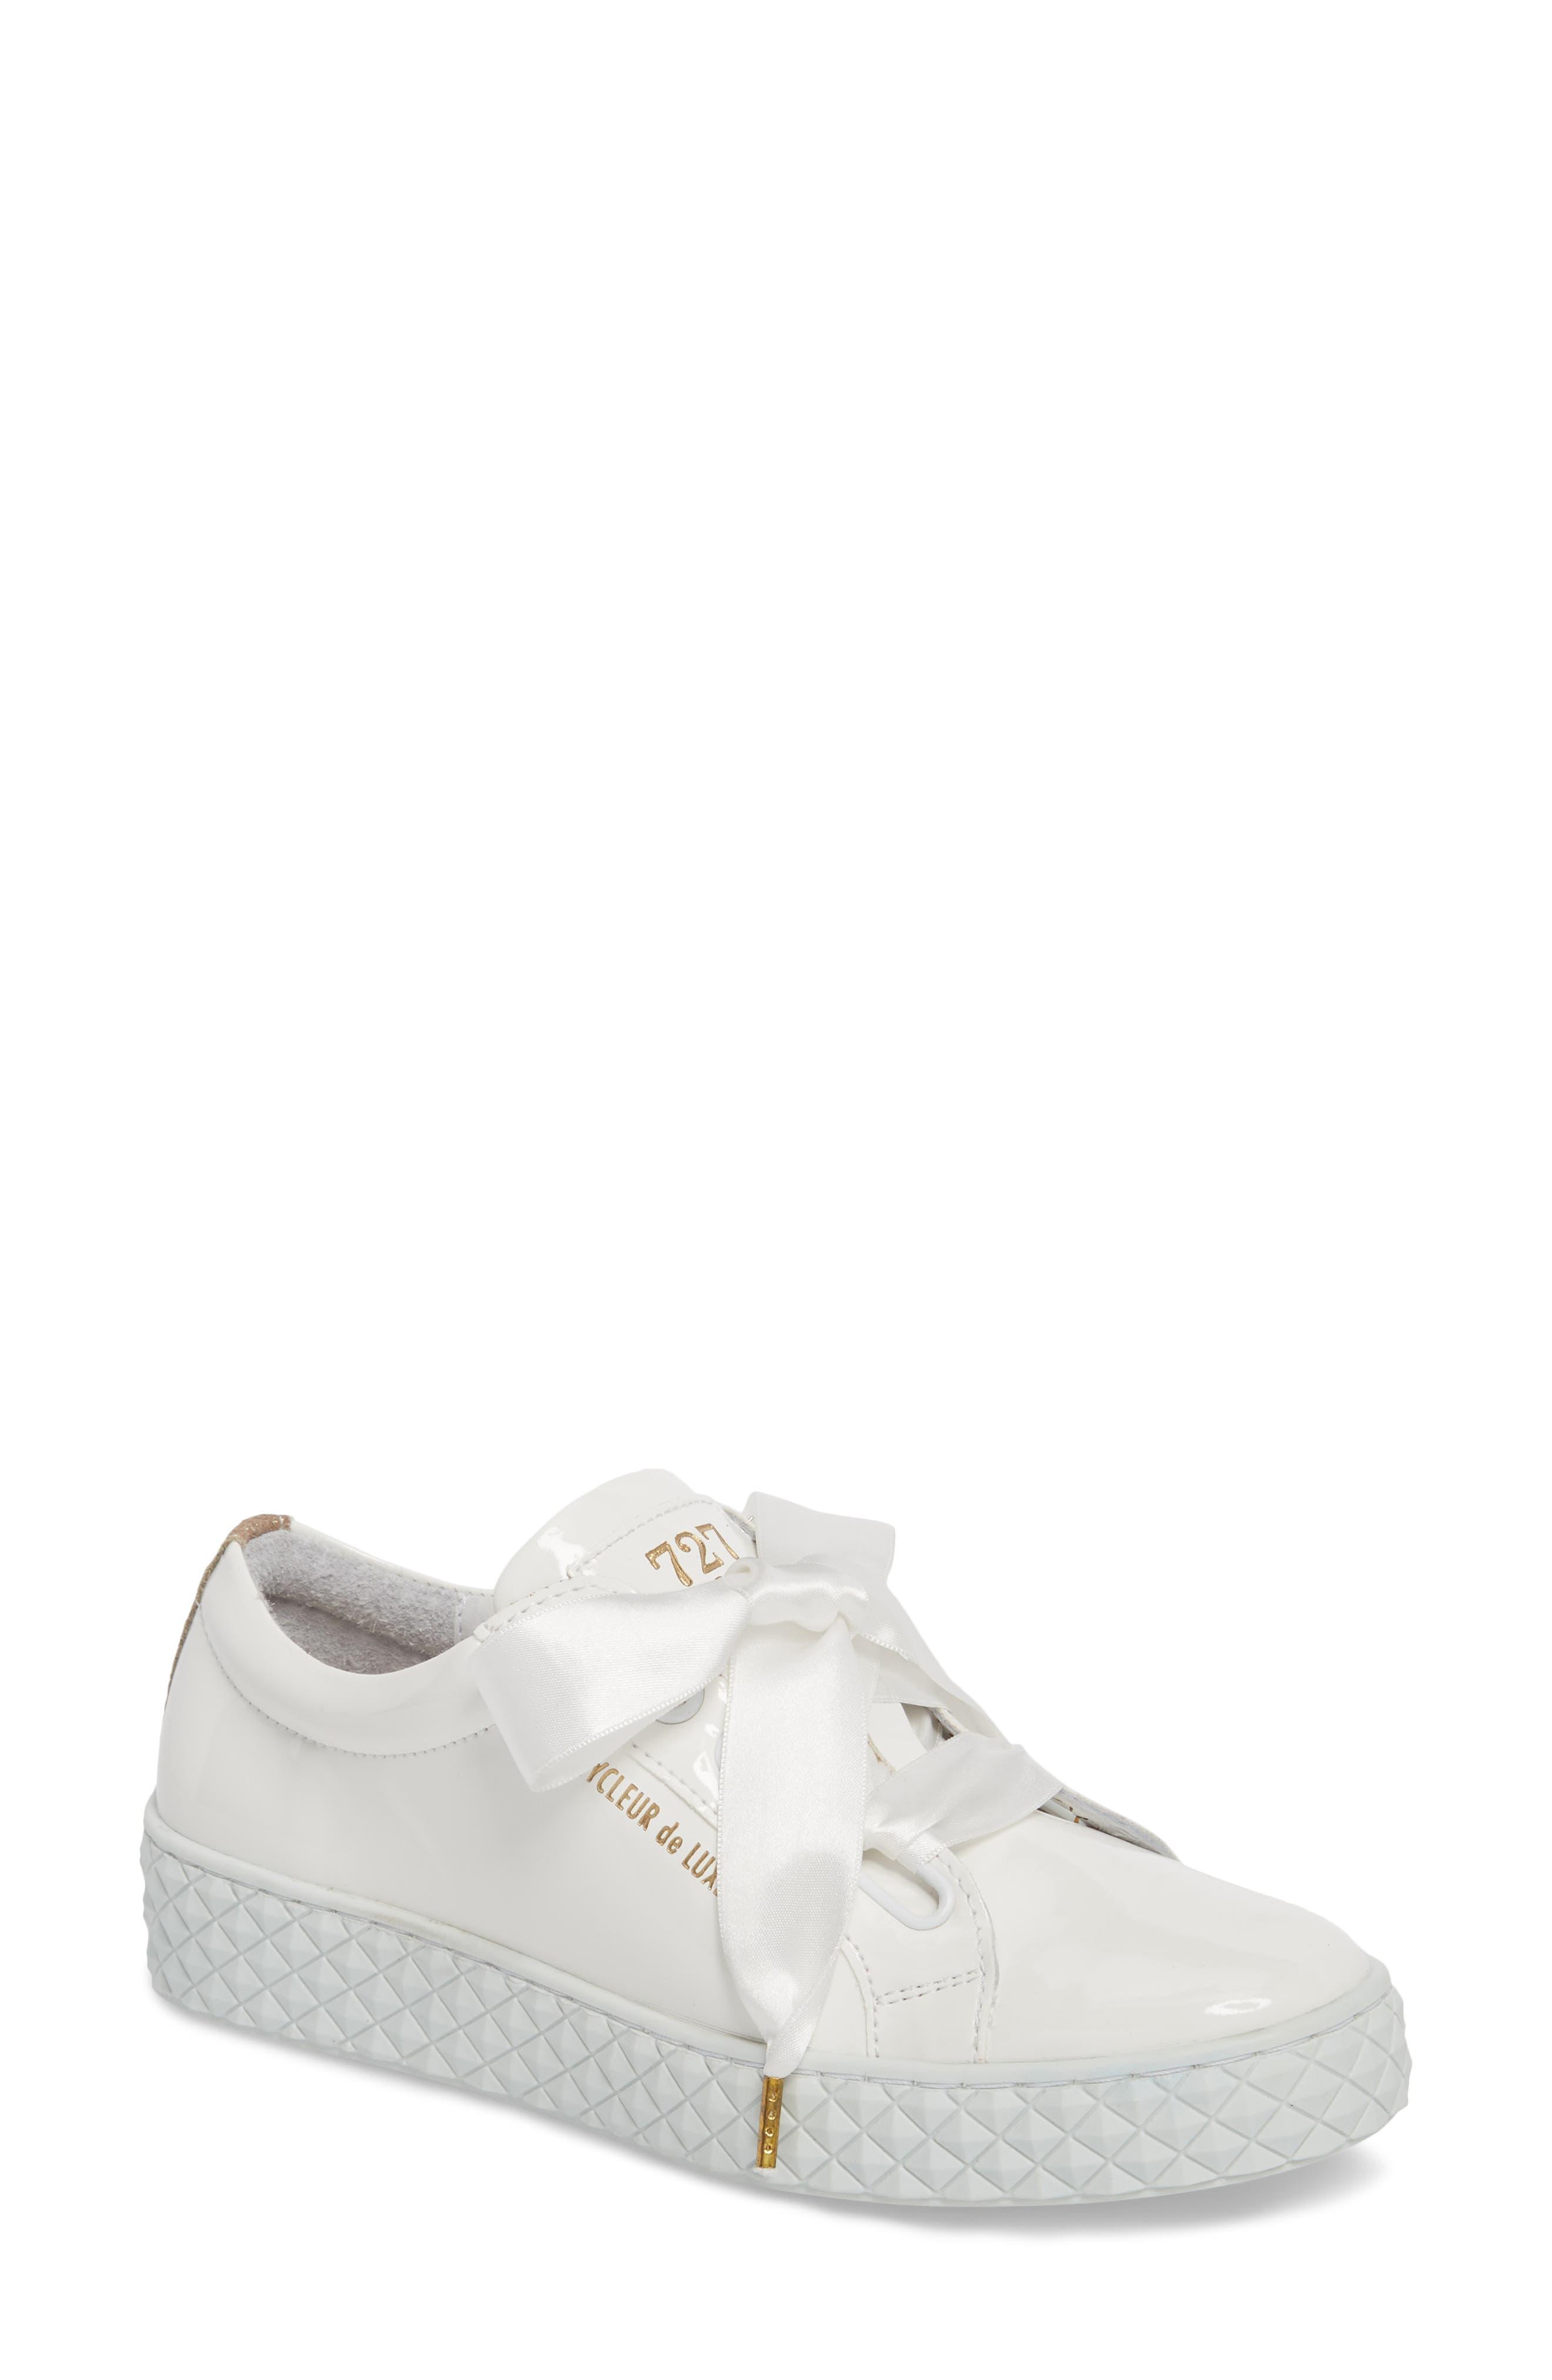 Acton Sneaker,                             Main thumbnail 1, color,                             WHITE PATENT